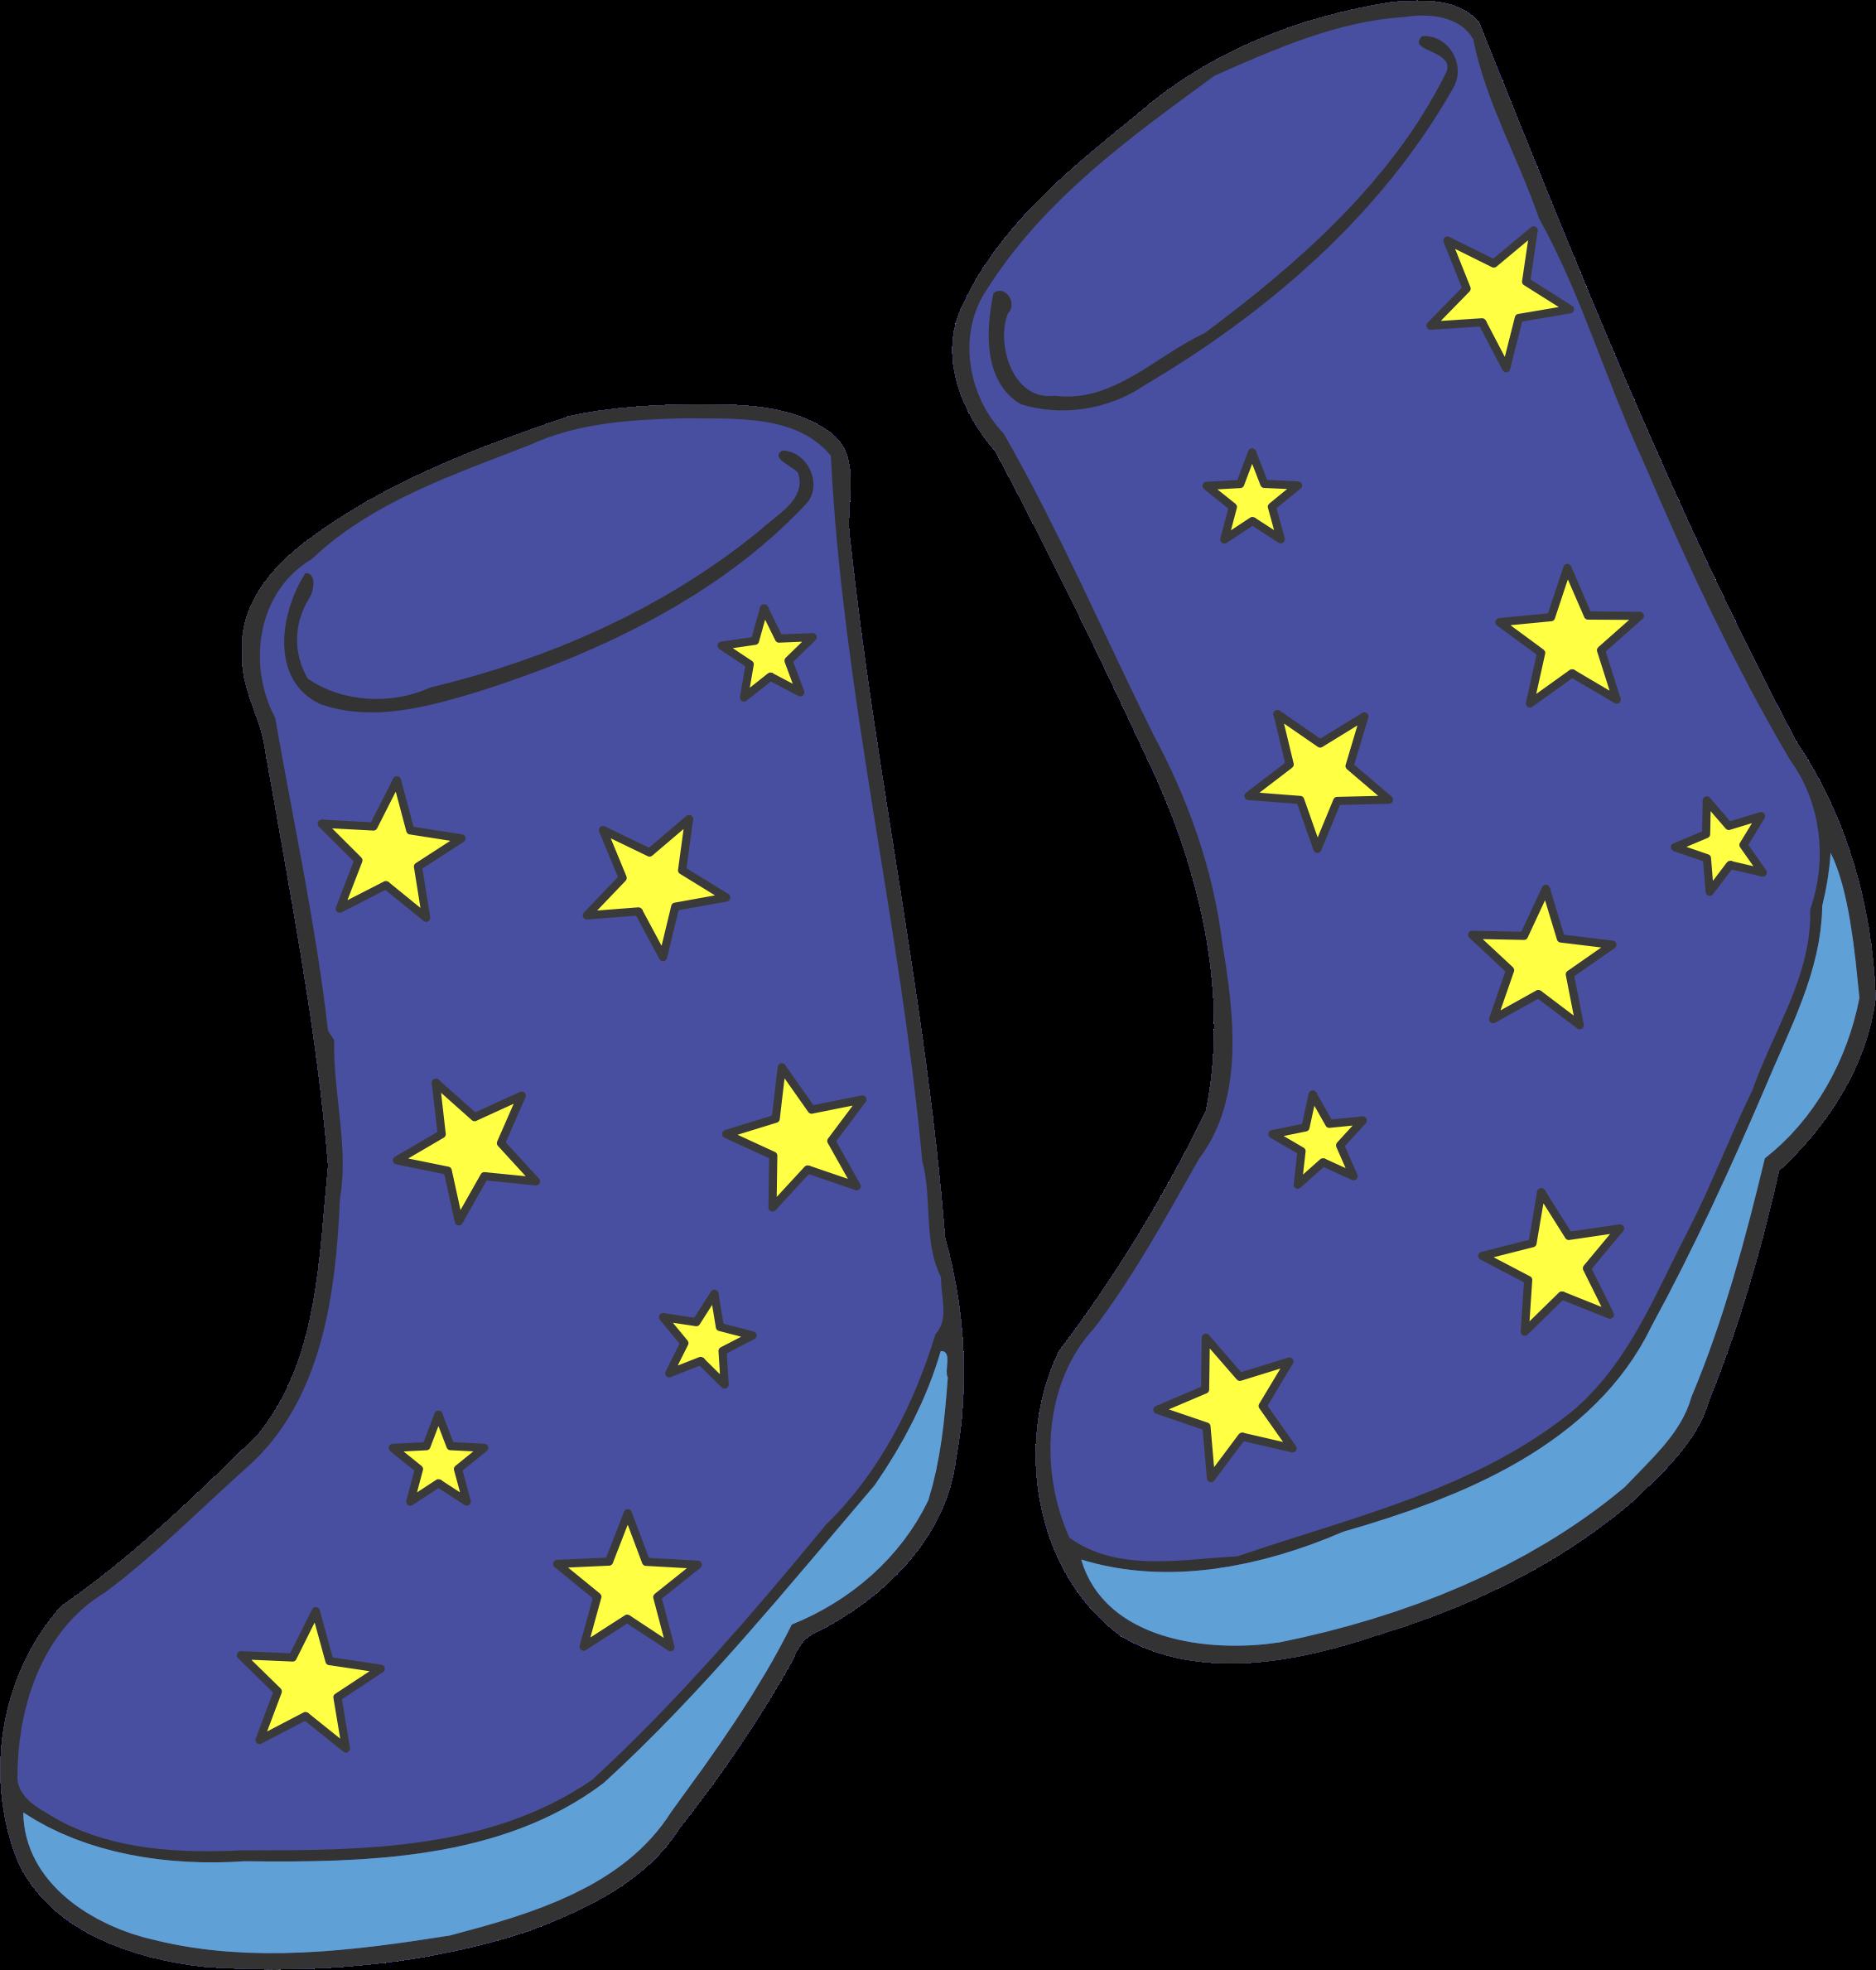 Wellington boots big image. Clipart socks blue boot